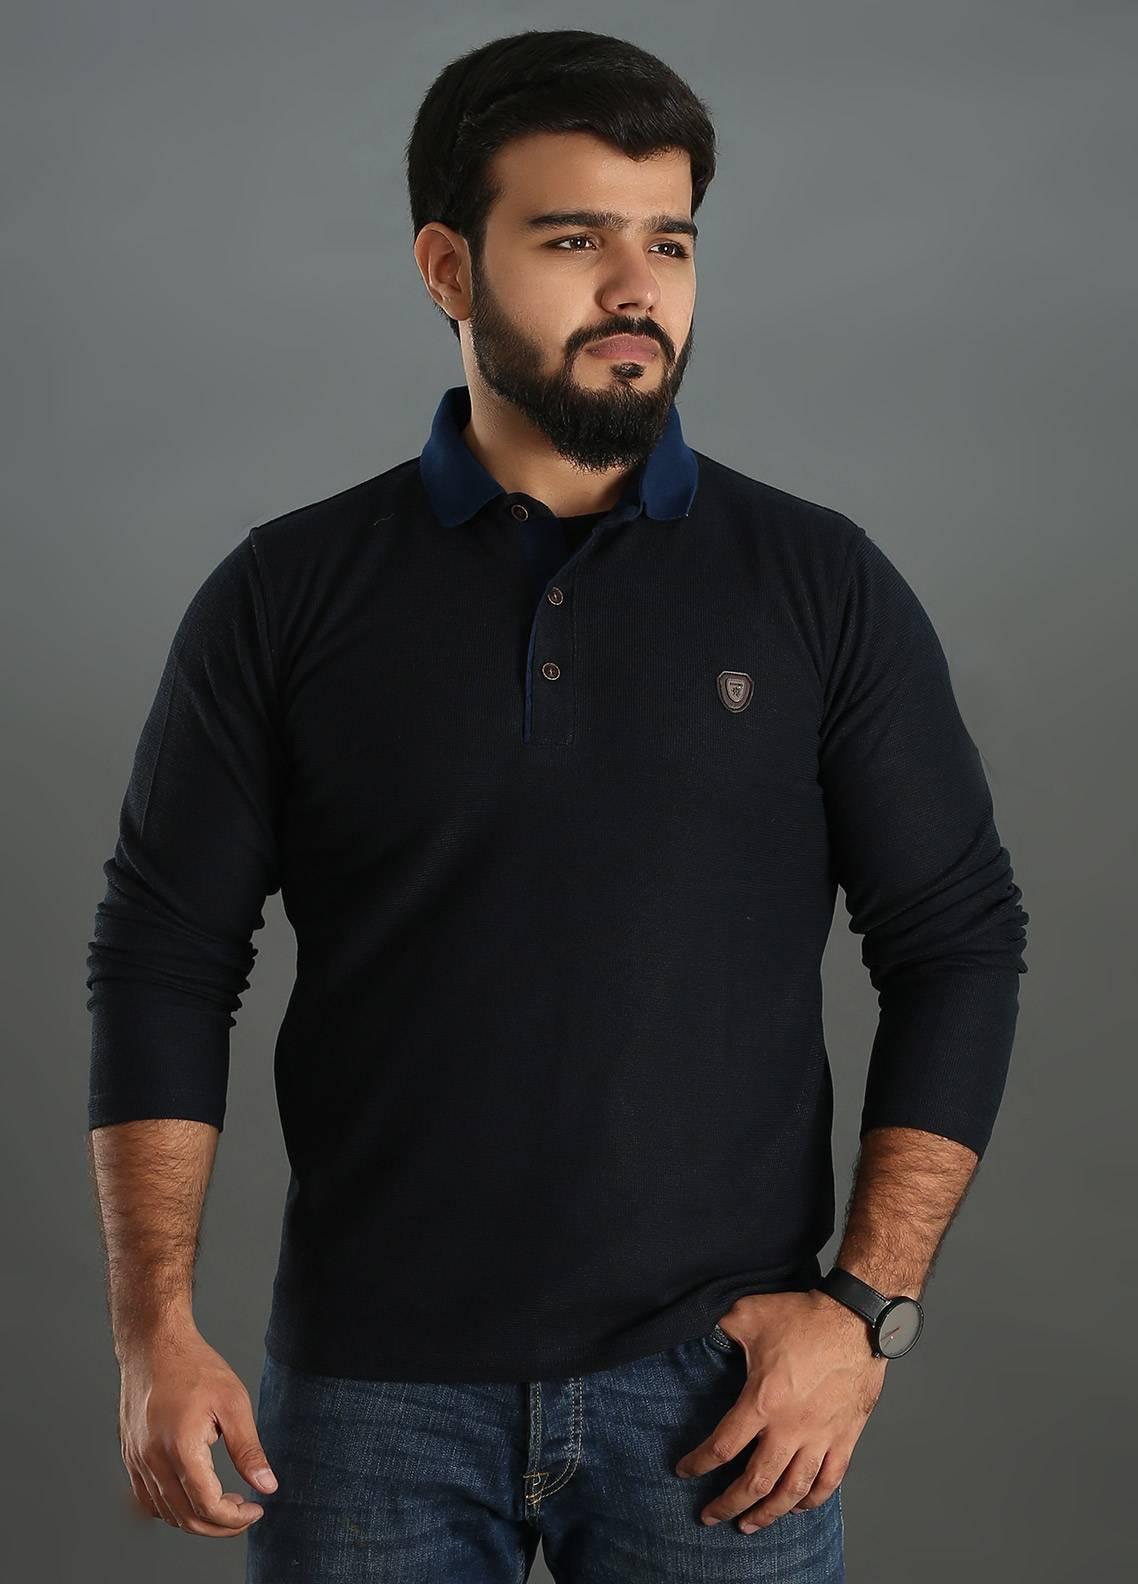 Sanaulla Exclusive Range Jersey Polo Men Full Sleeves - Blue SAM18TS 02